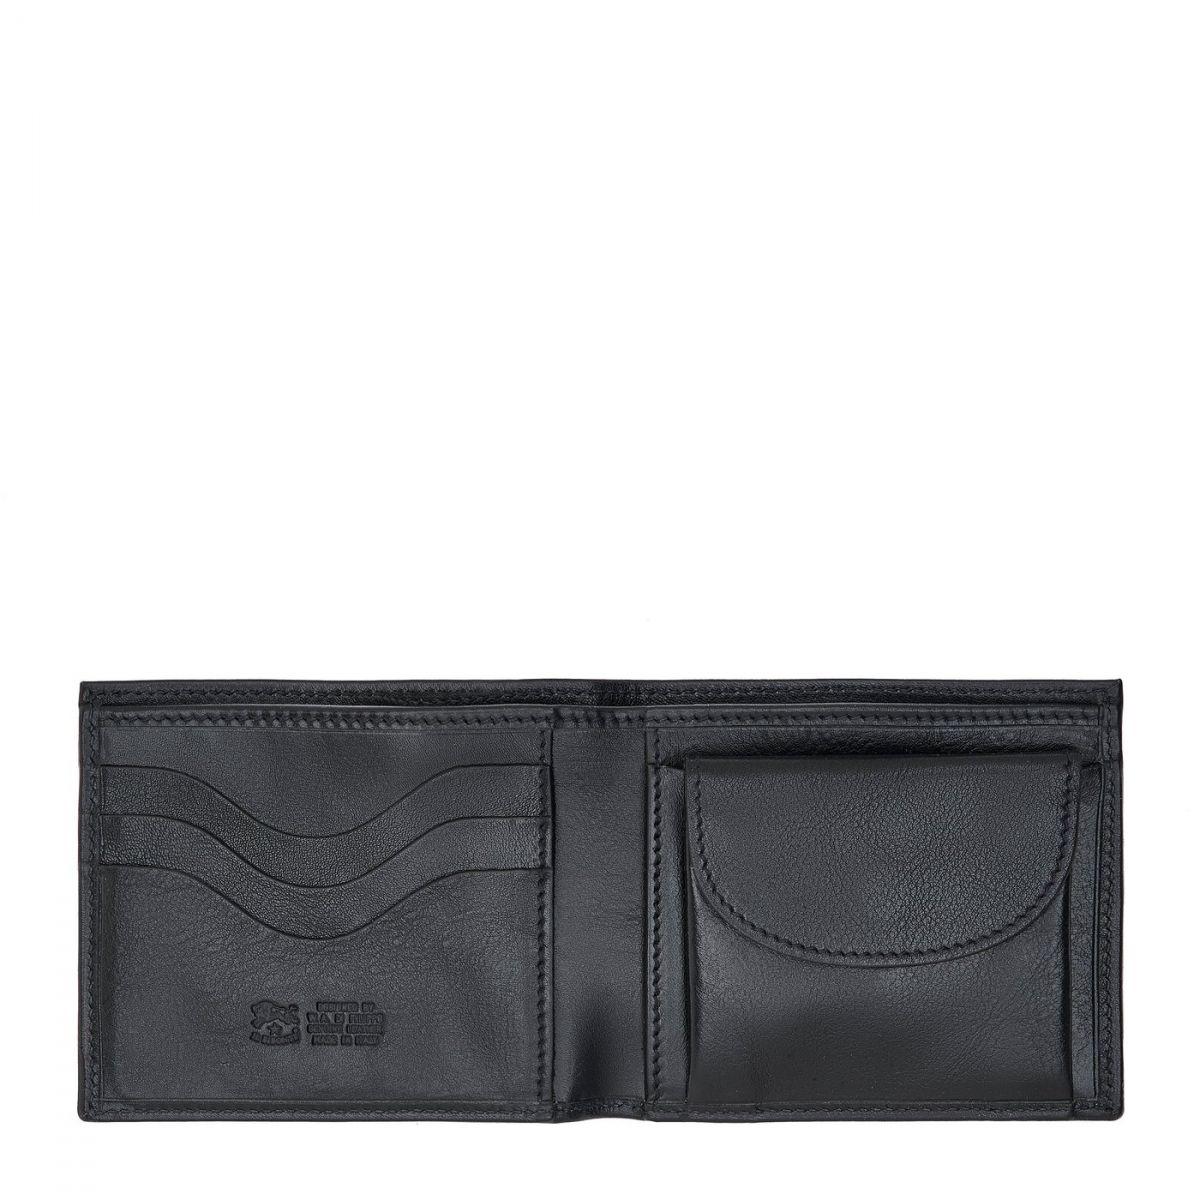 Men's Bi-Fold Wallet  in Cowhide Double Leather SBW023 color Black | Details